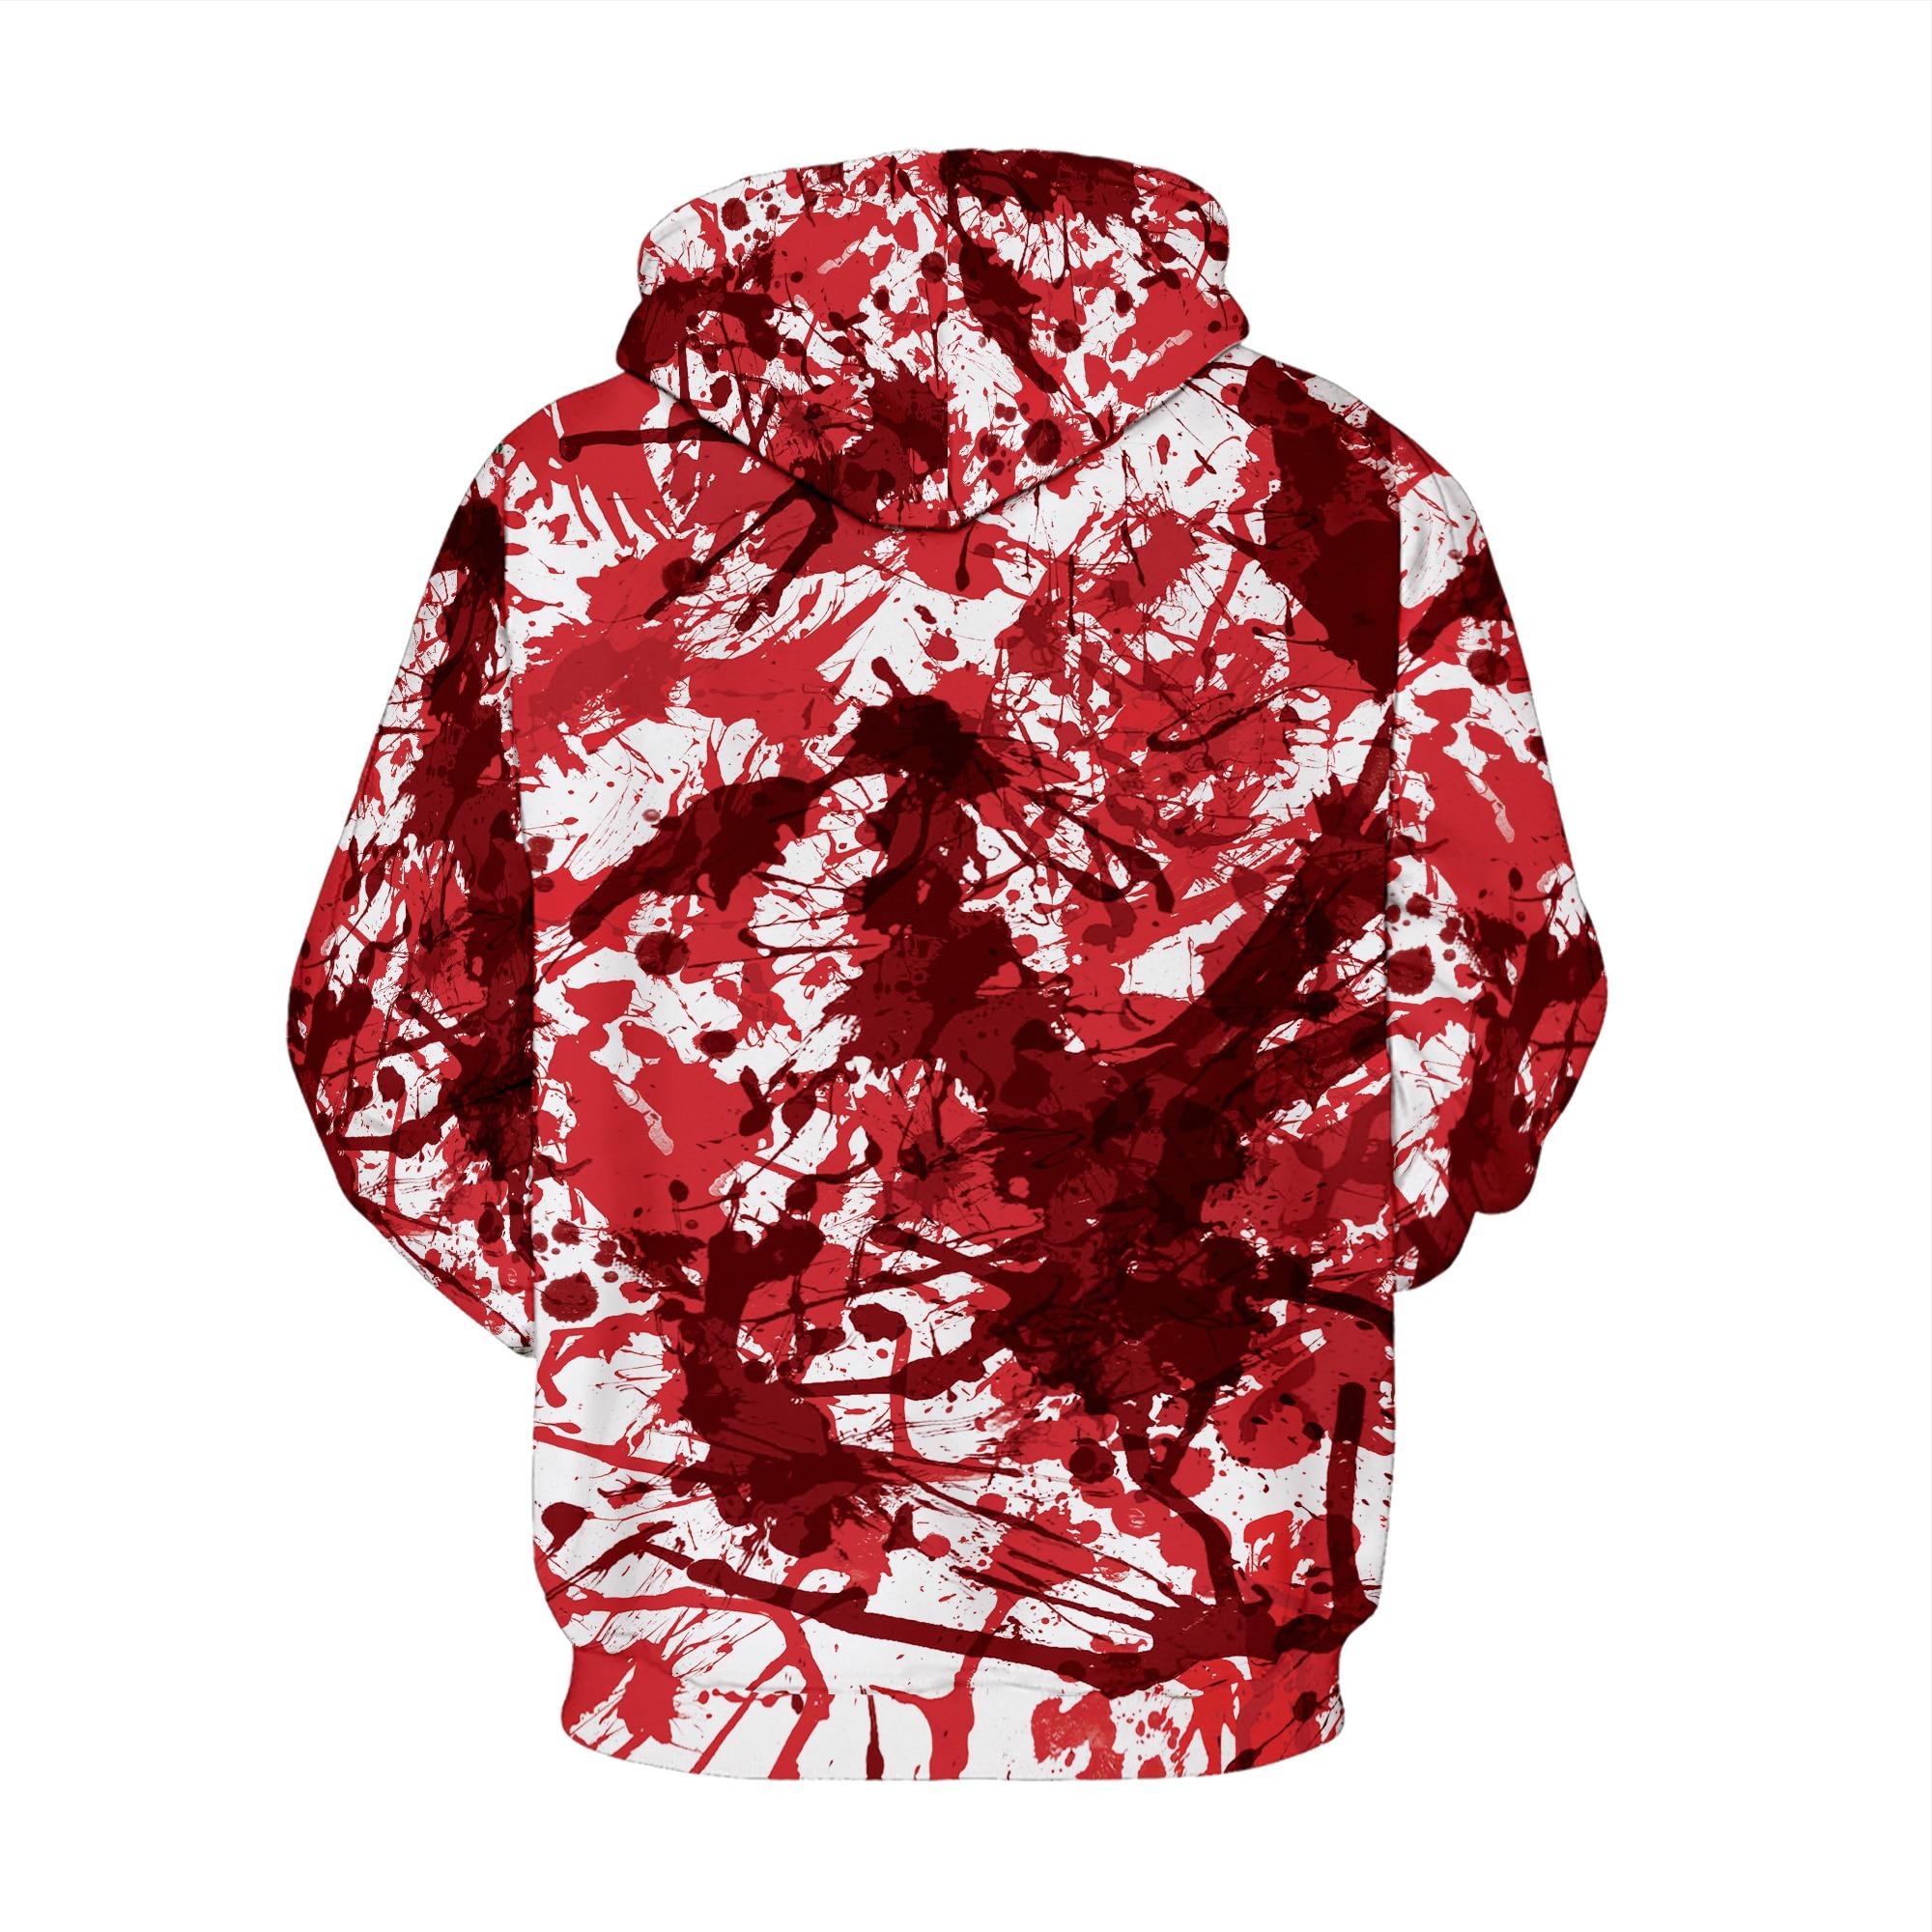 3D Print Sweatshirt 2019 Men Women Hoodies Big Red lips Graphic Hip Hop Streetwear Pullover Tracksuit Couples Halloween Tops in Hoodies amp Sweatshirts from Men 39 s Clothing